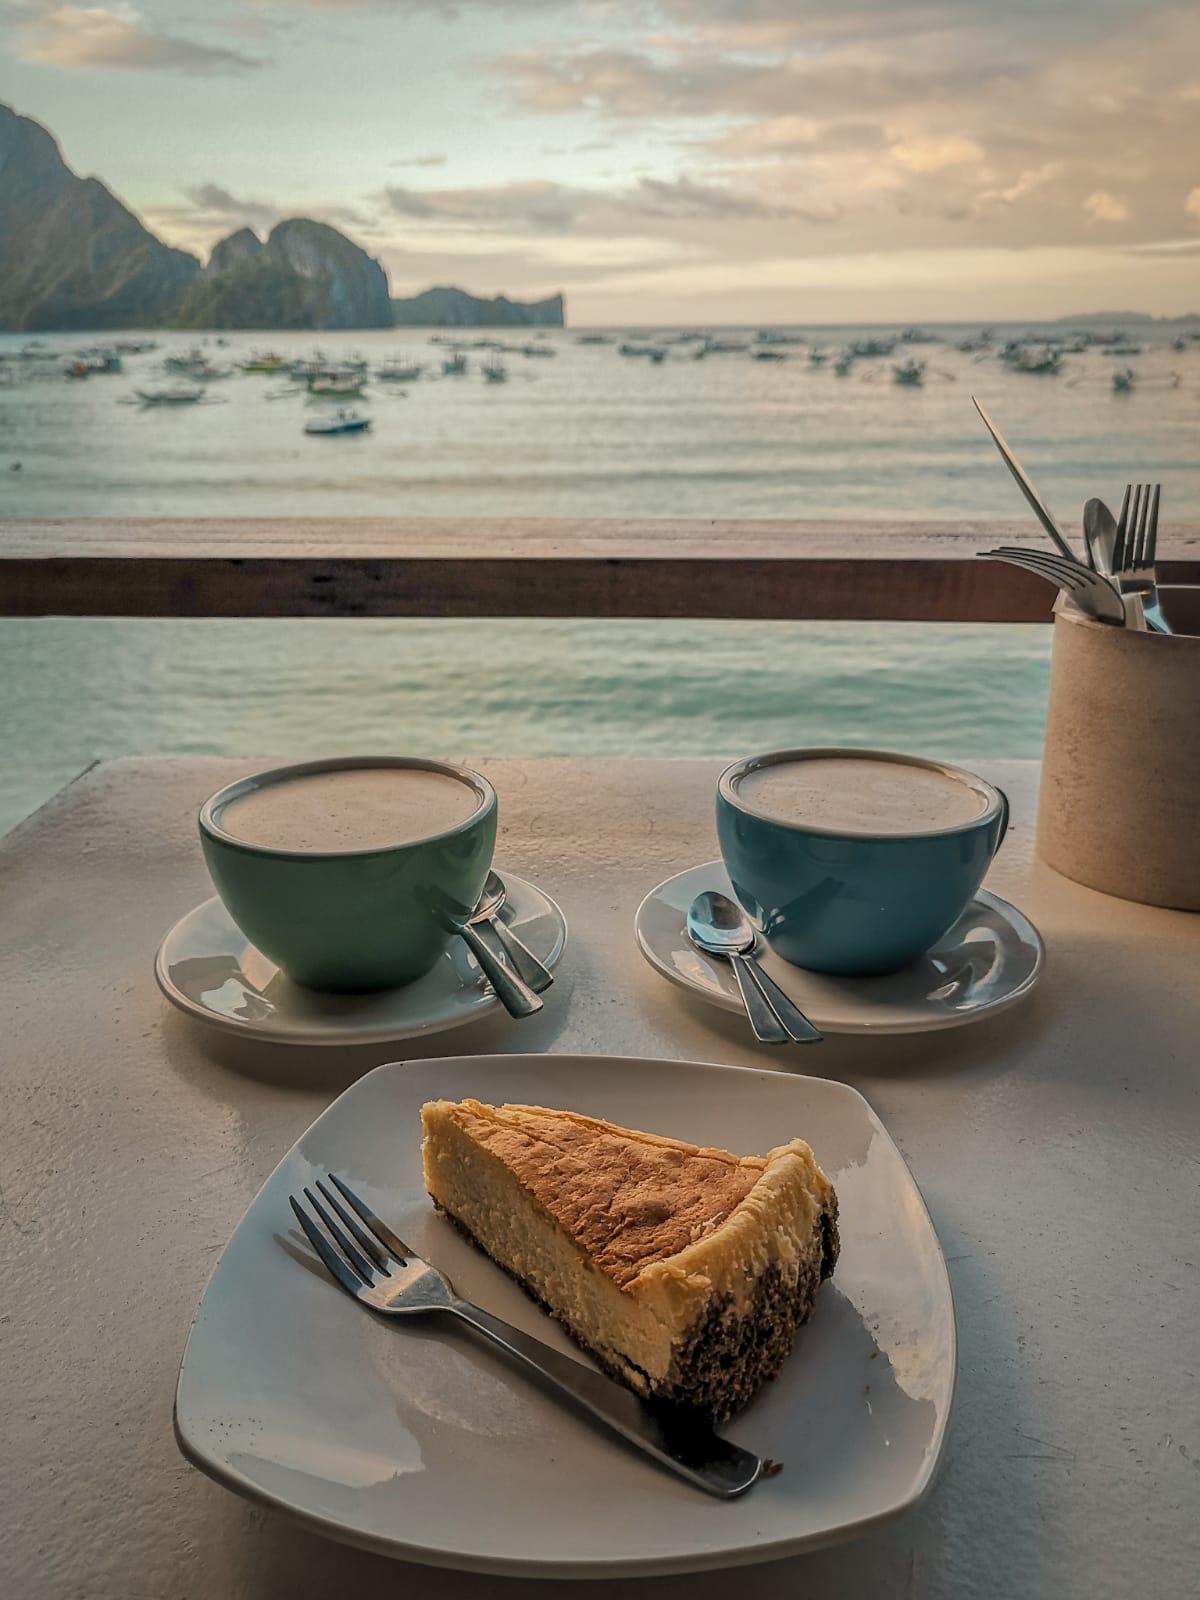 travel-blog-blogger-redhead-round-the-world-philippines-el-nido-dessert-sunset-coffee.jpg